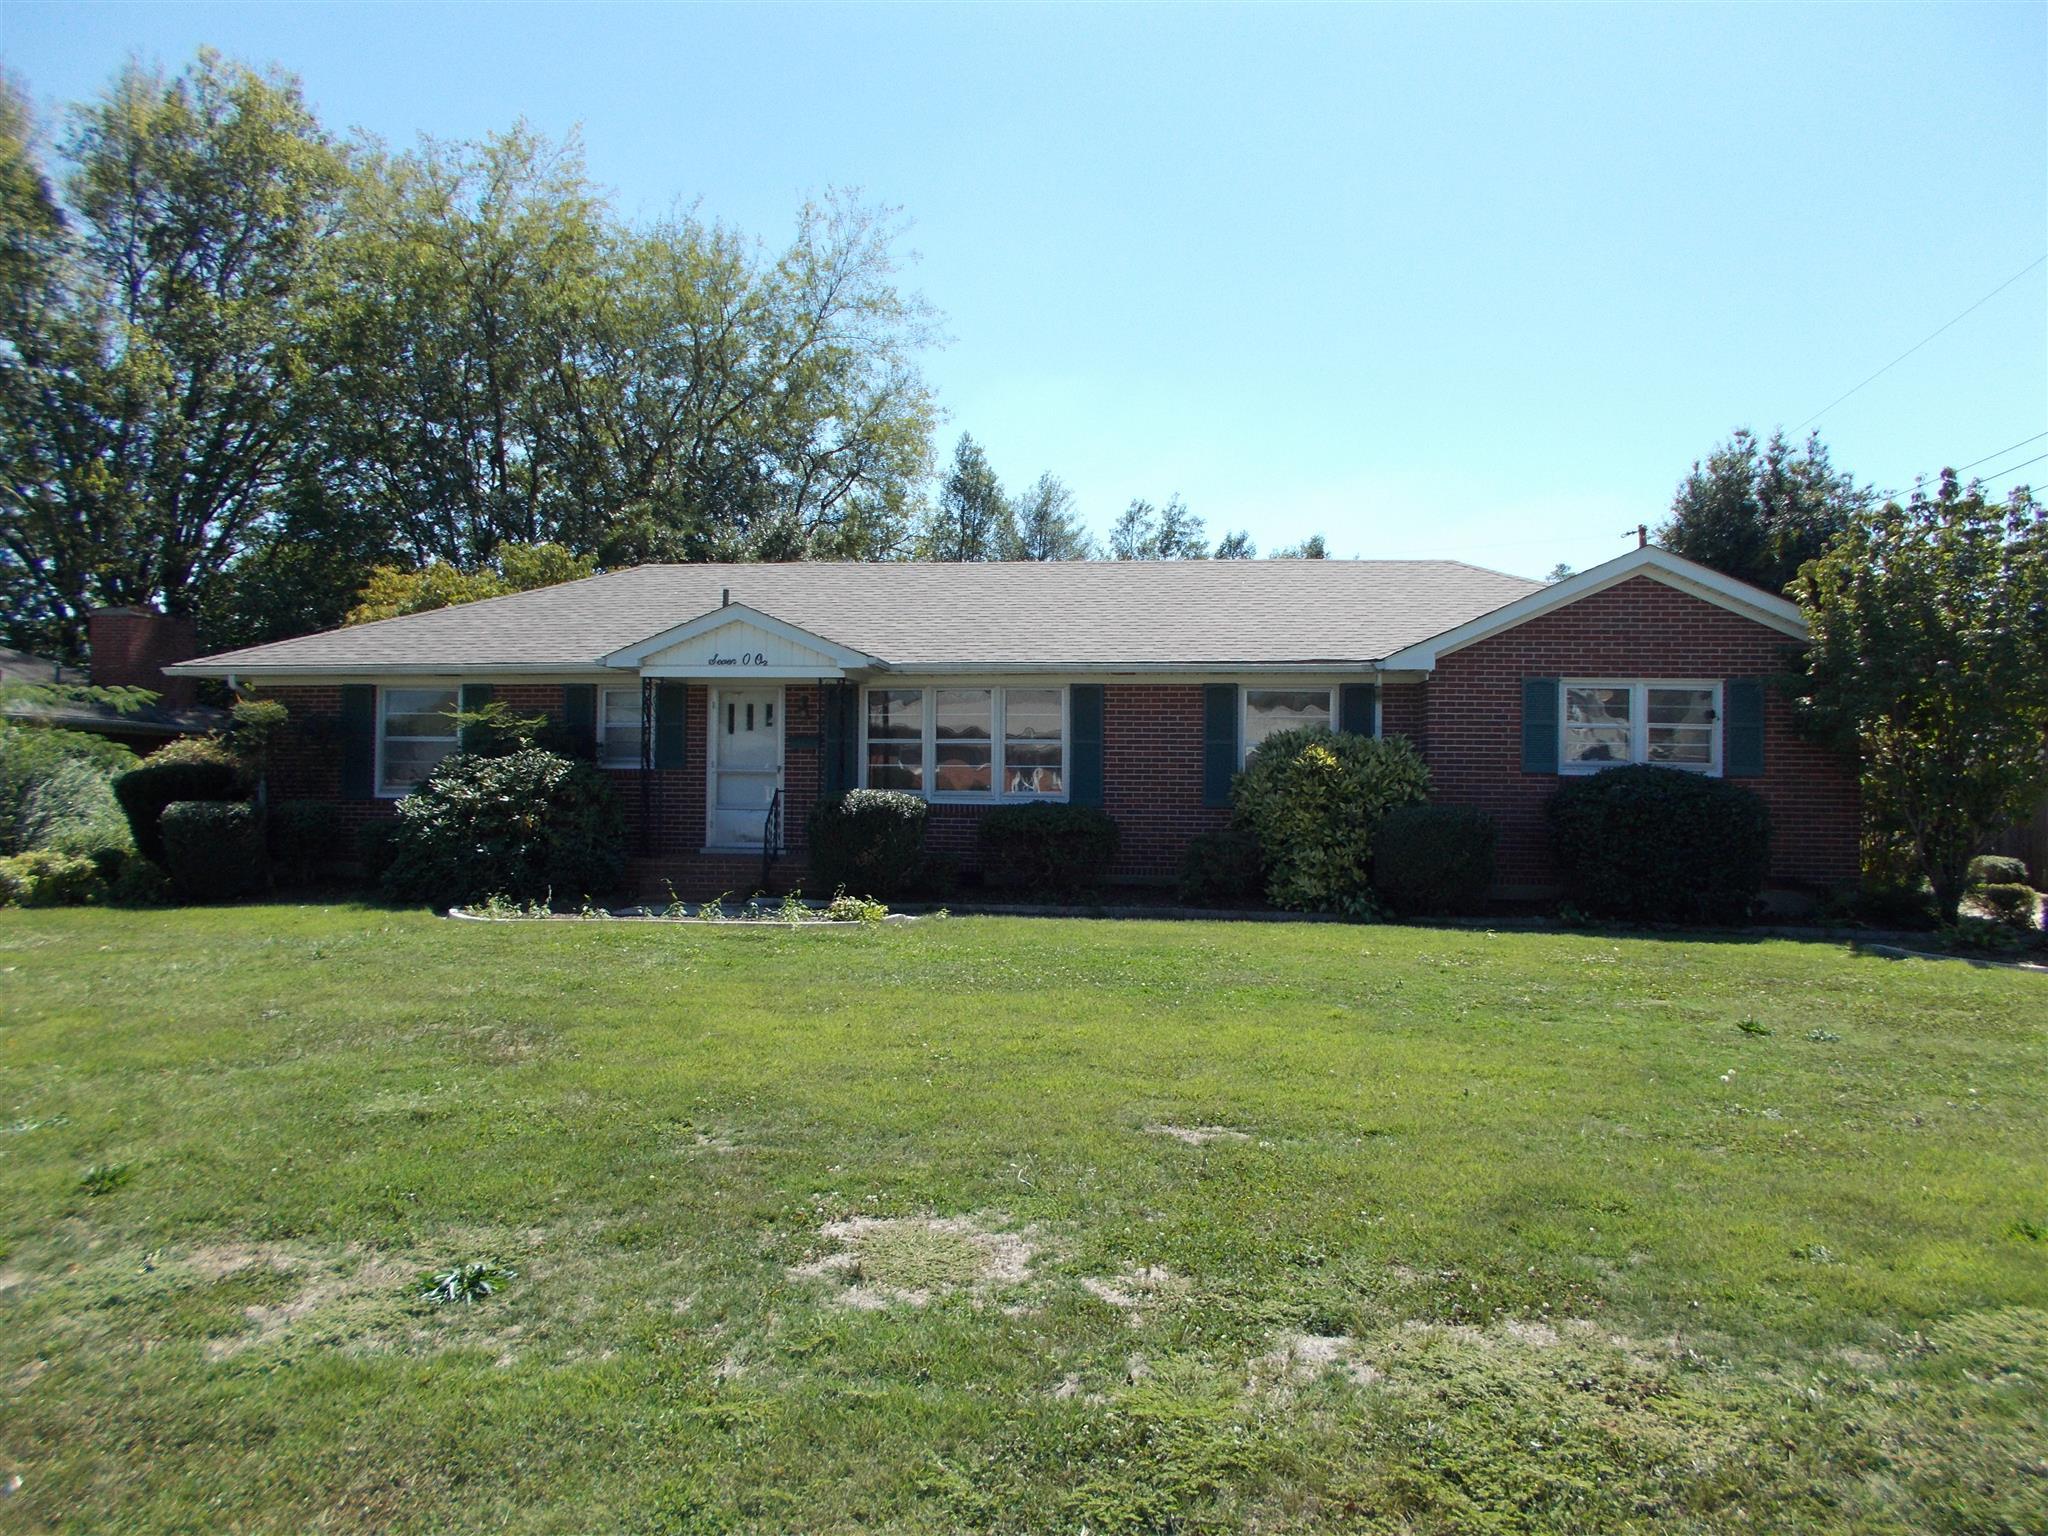 701 2nd St, Lawrenceburg, TN 38464